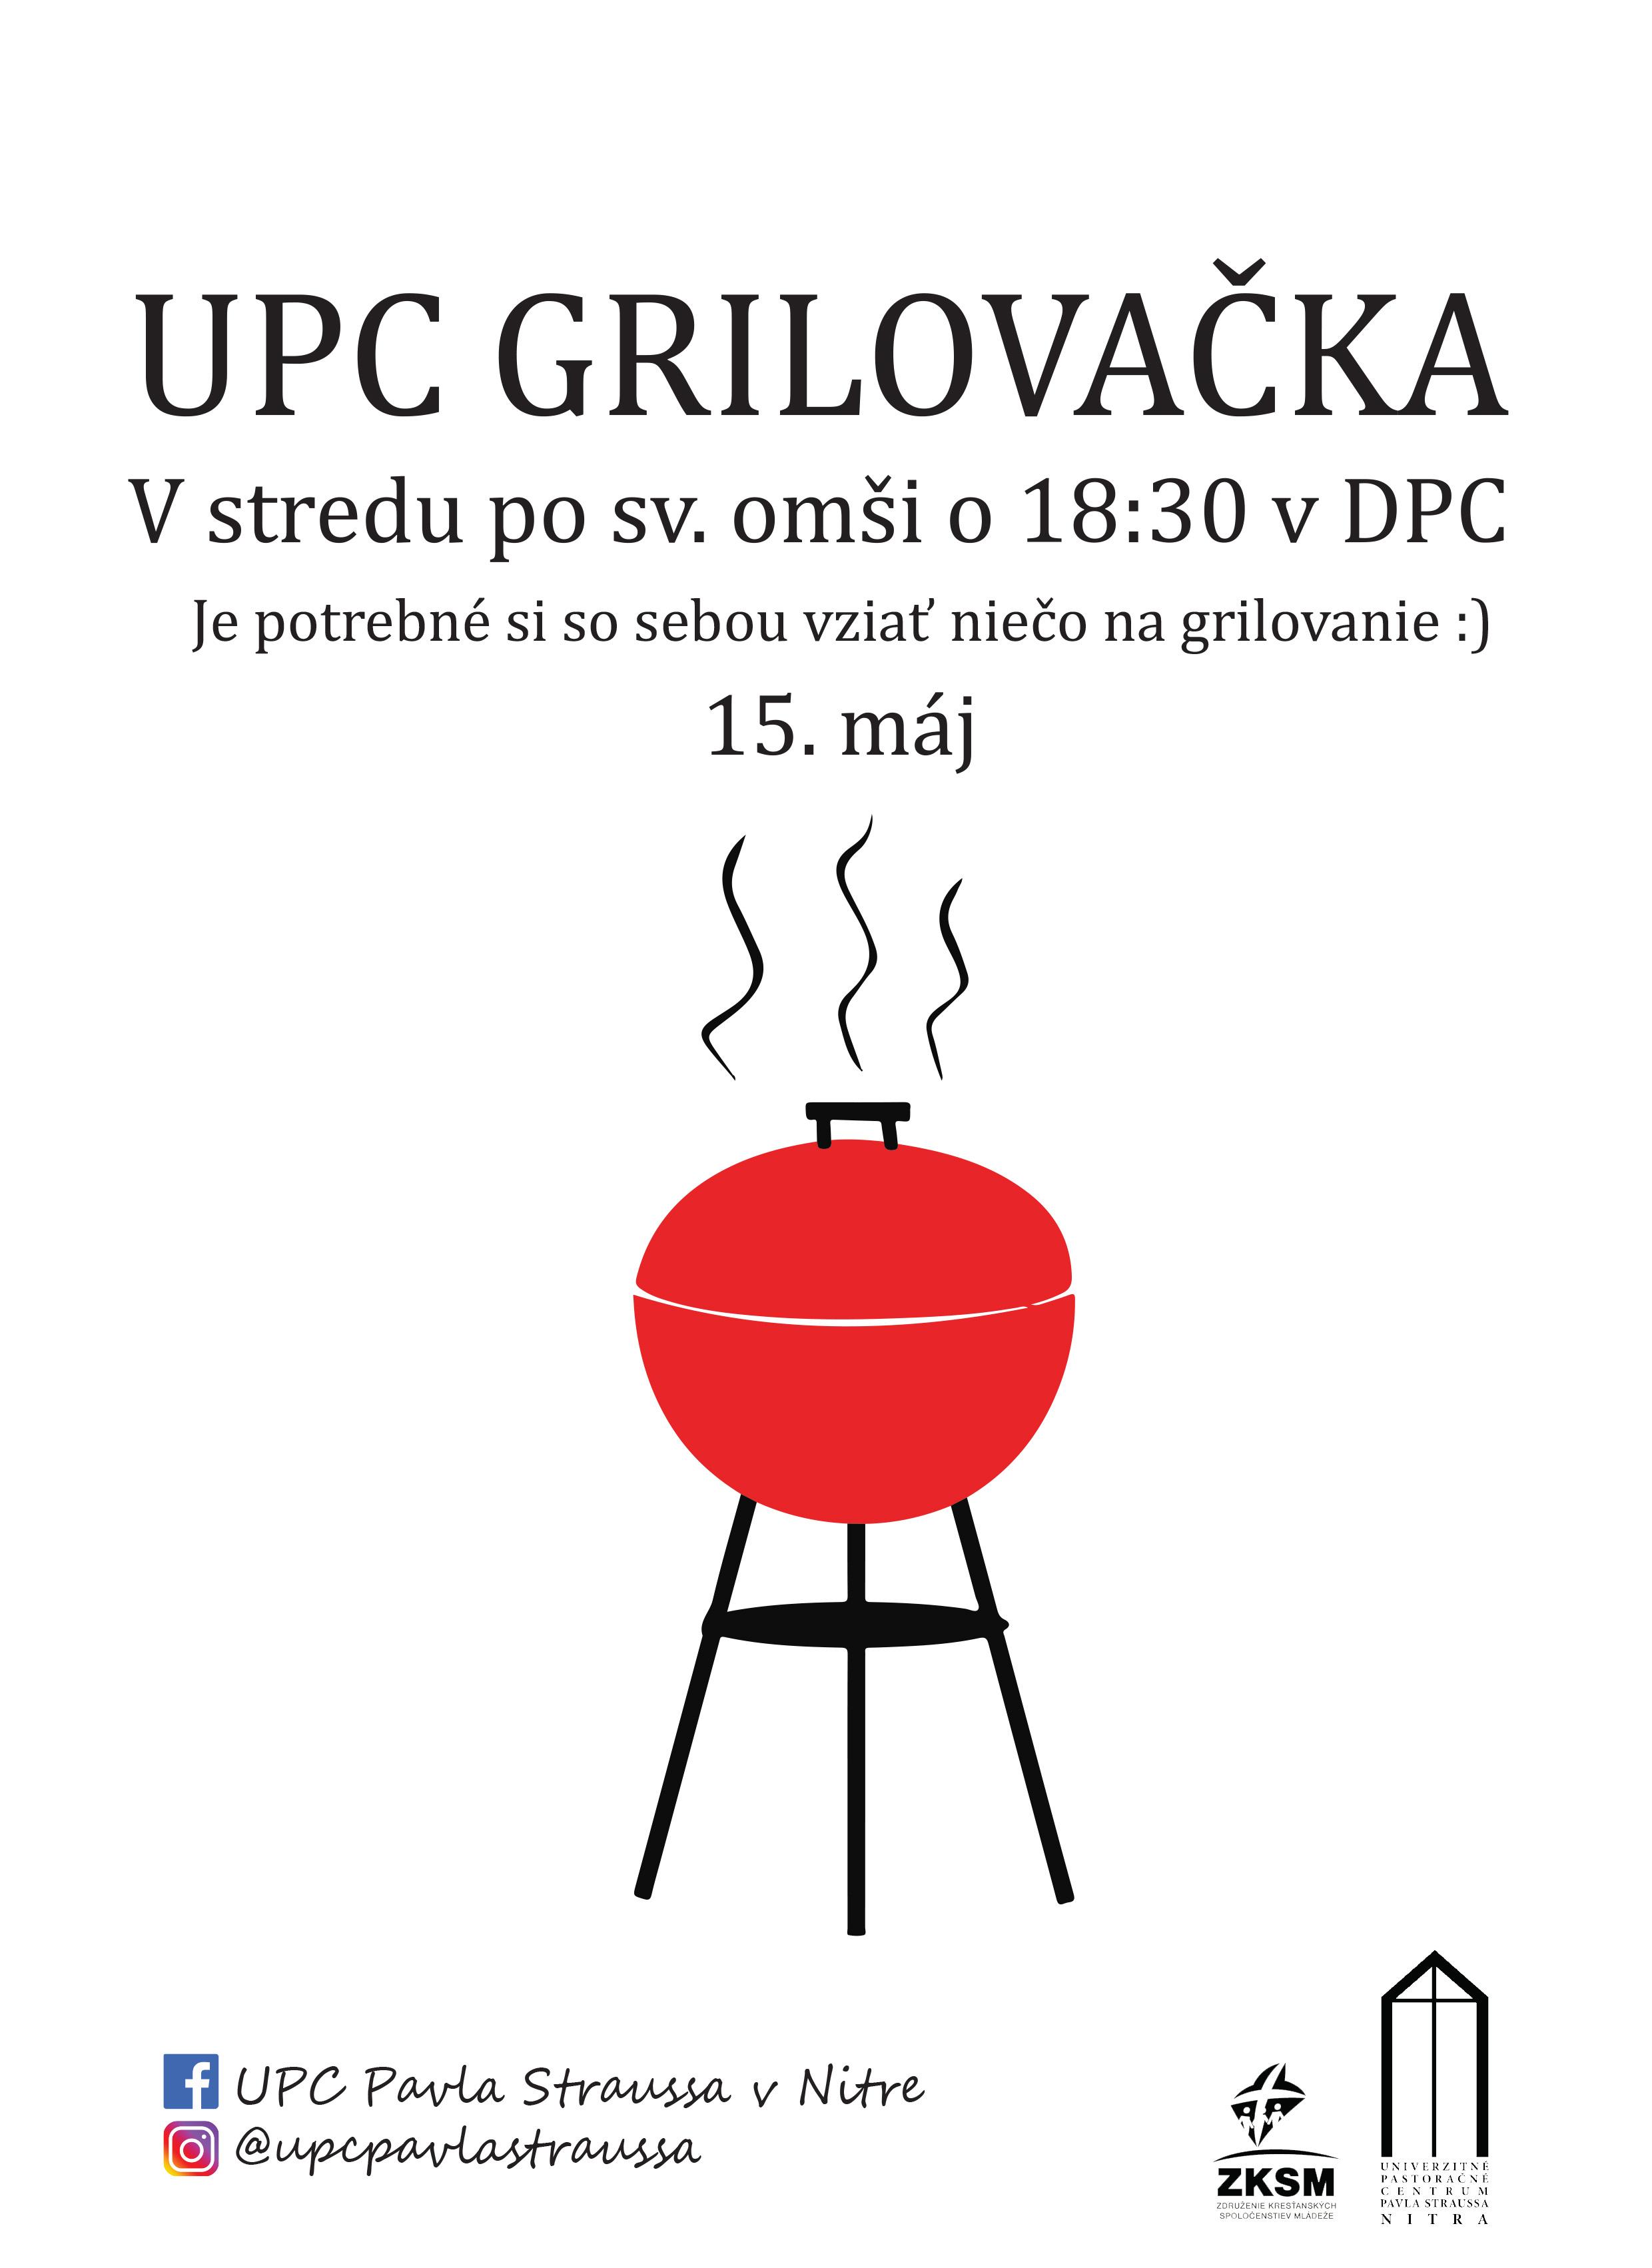 Grilovačka DPC 2019